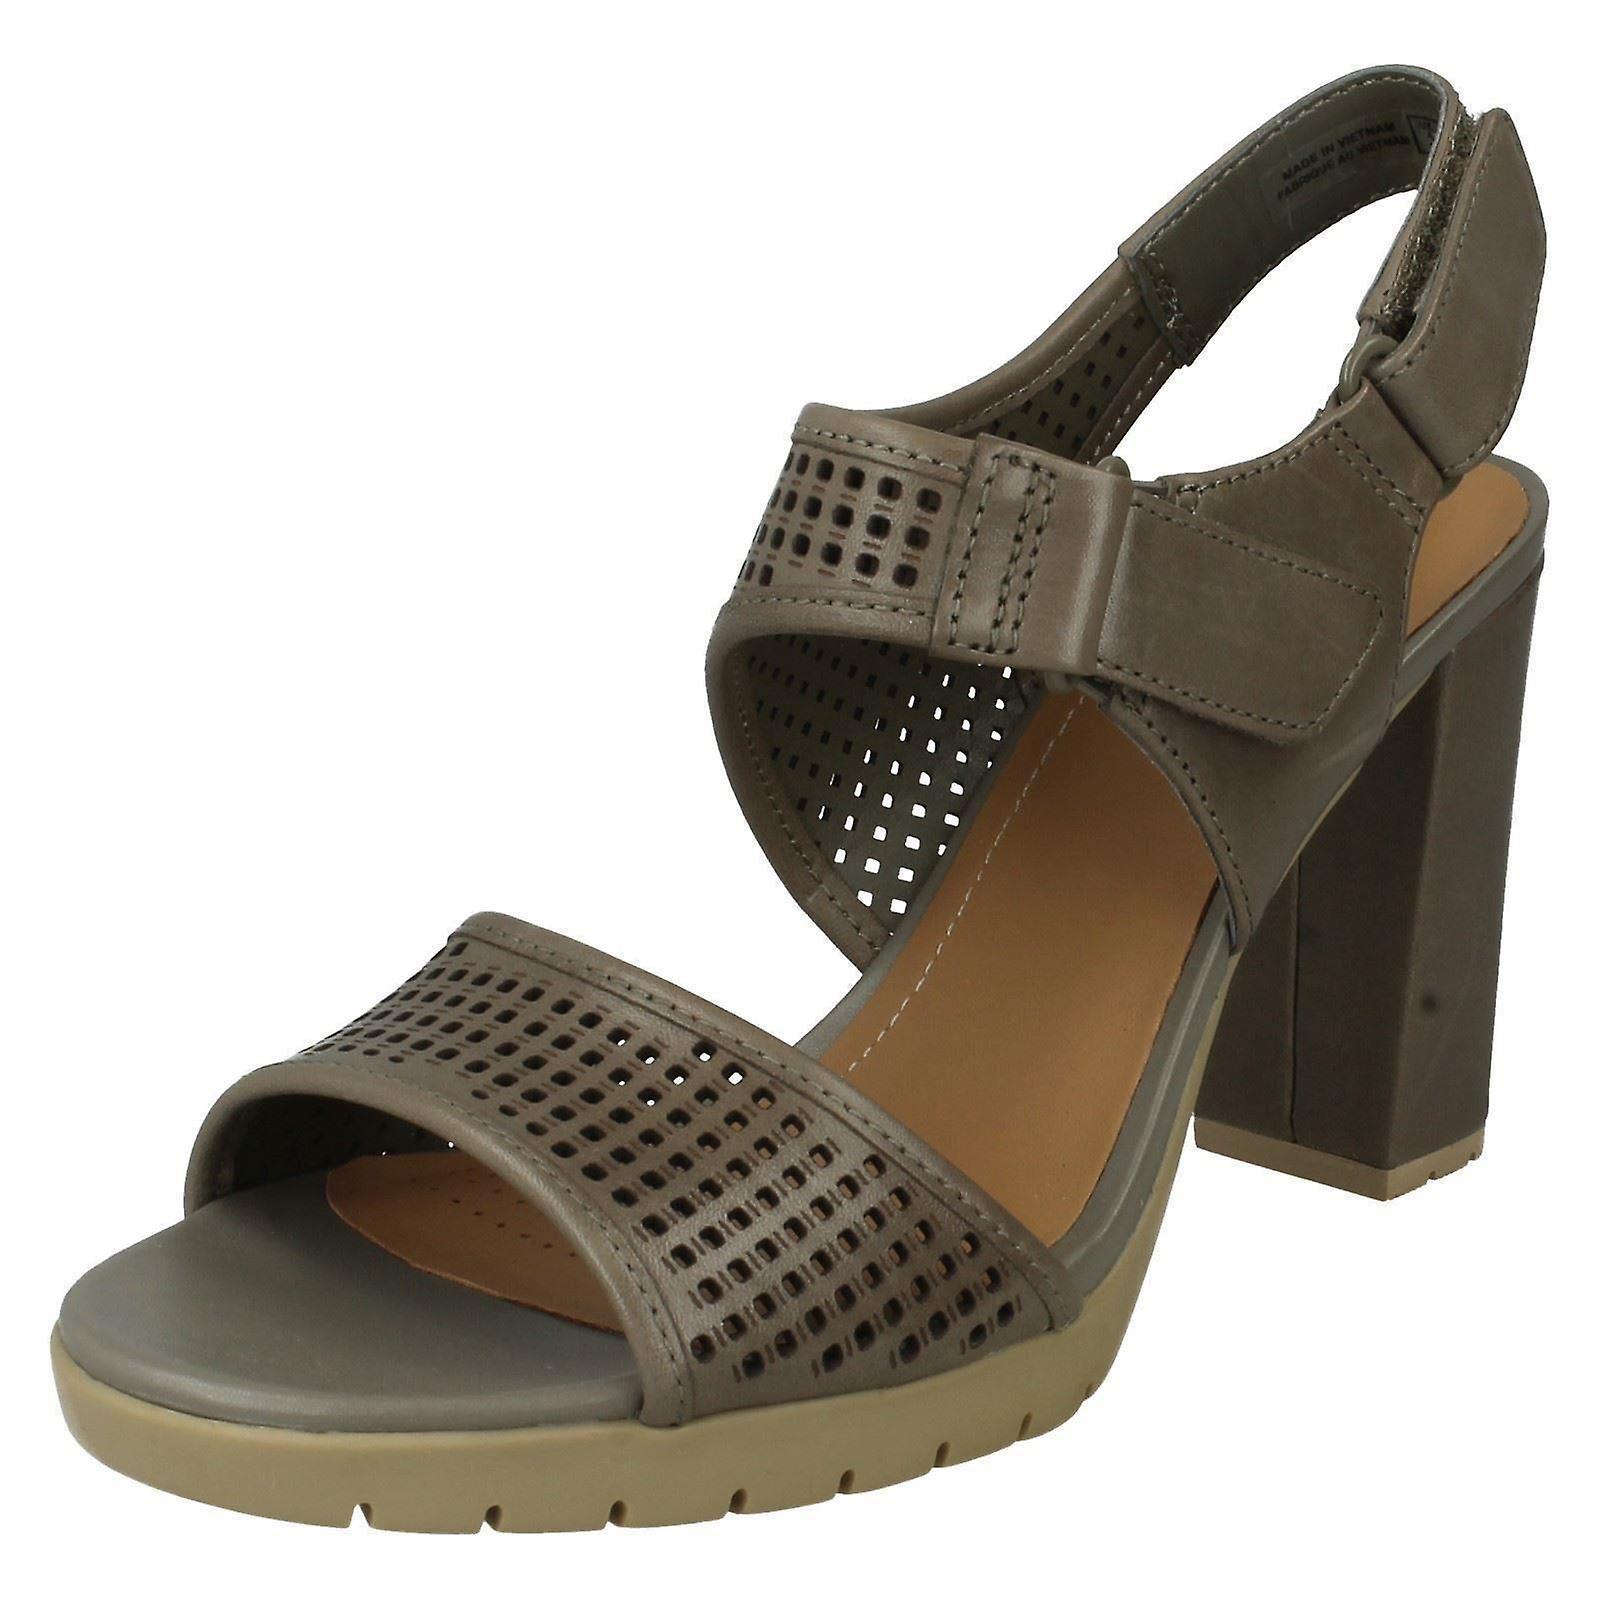 Ladies Clarks Casual Summer Sandals Pastina Estate skDVM